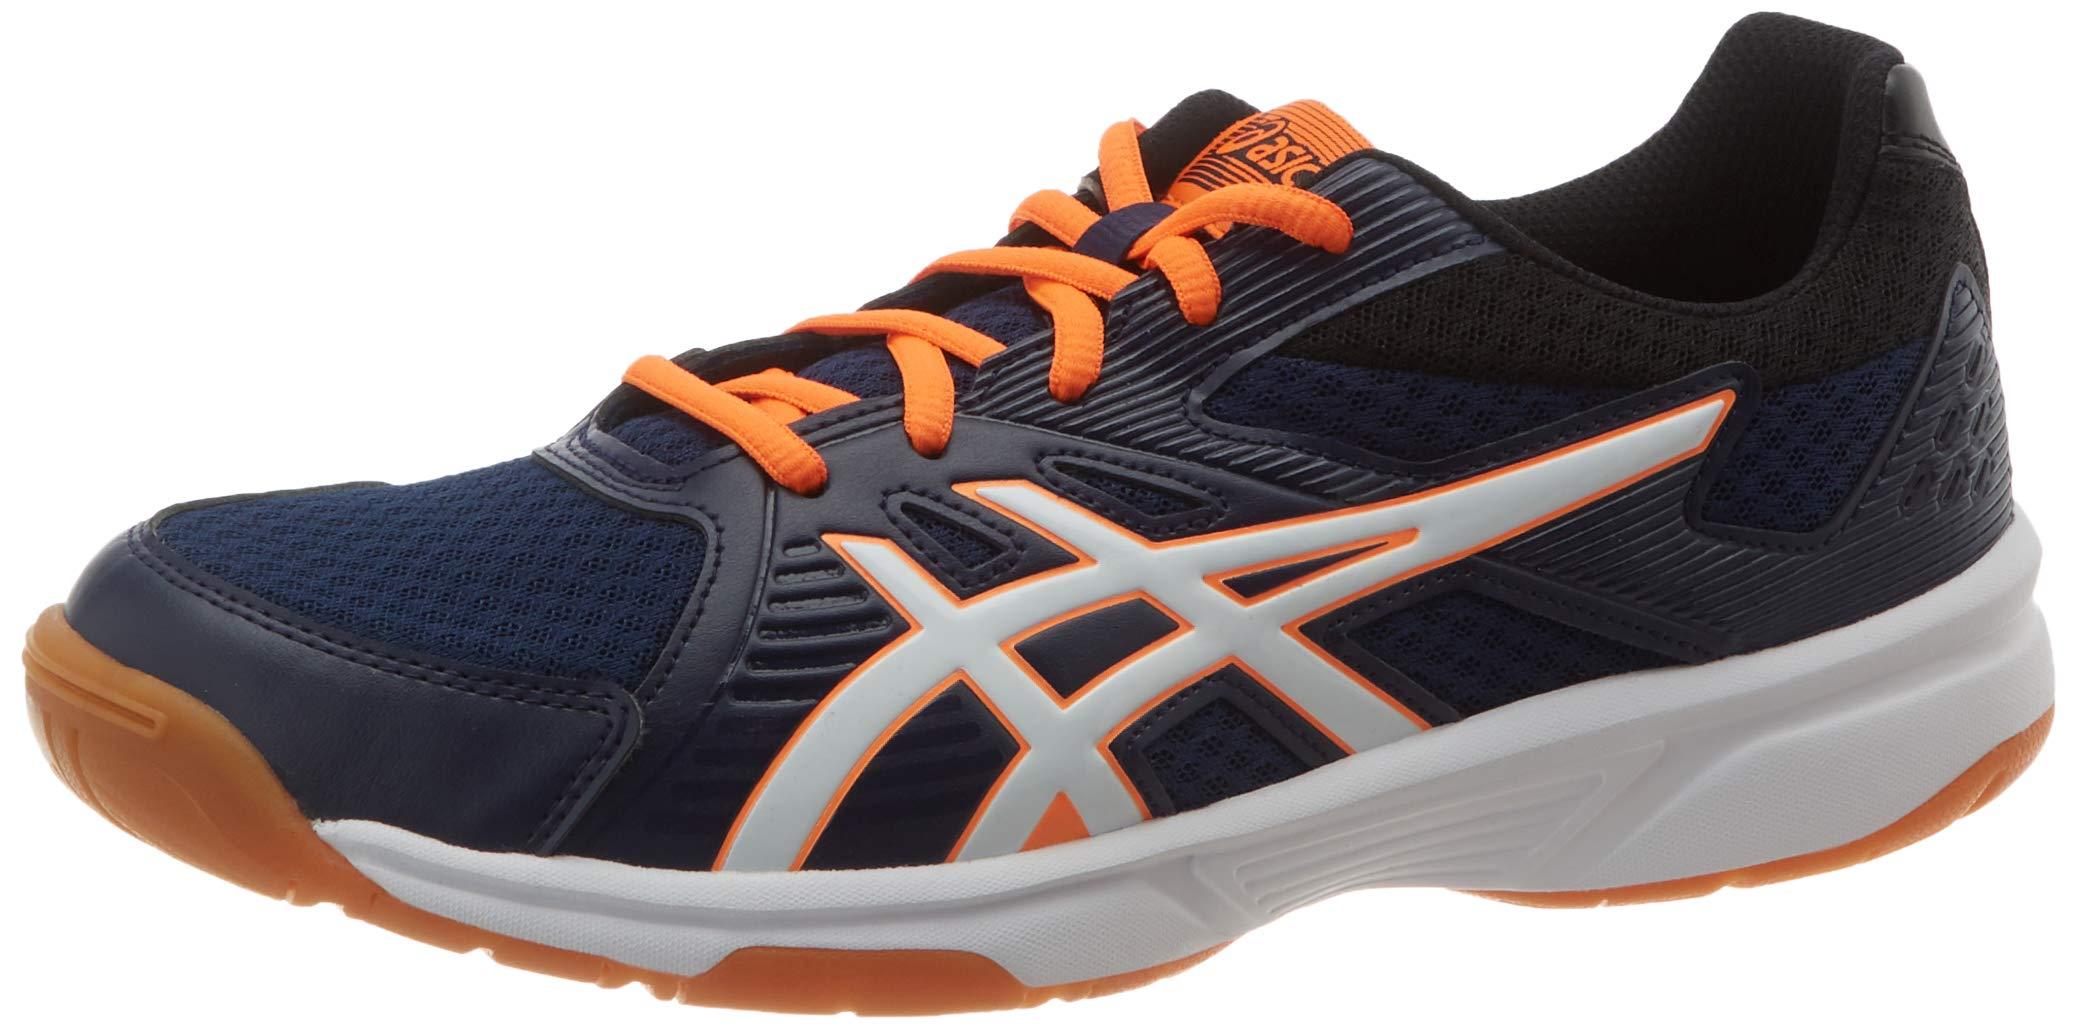 ASICS Men's Badminton Shoes- Buy Online